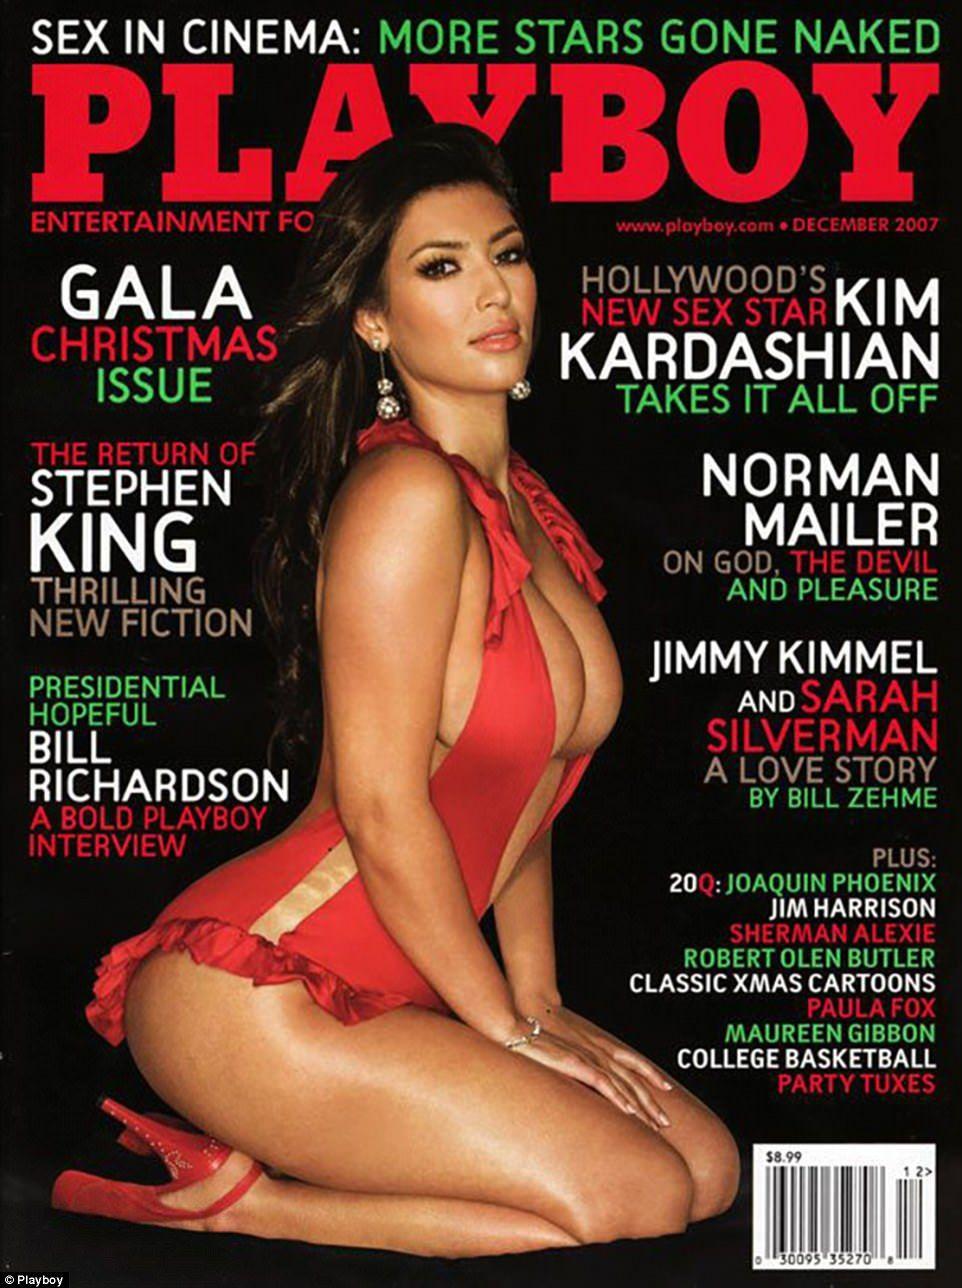 Kim kardashian naked in hugh hefner morgan nude pictures